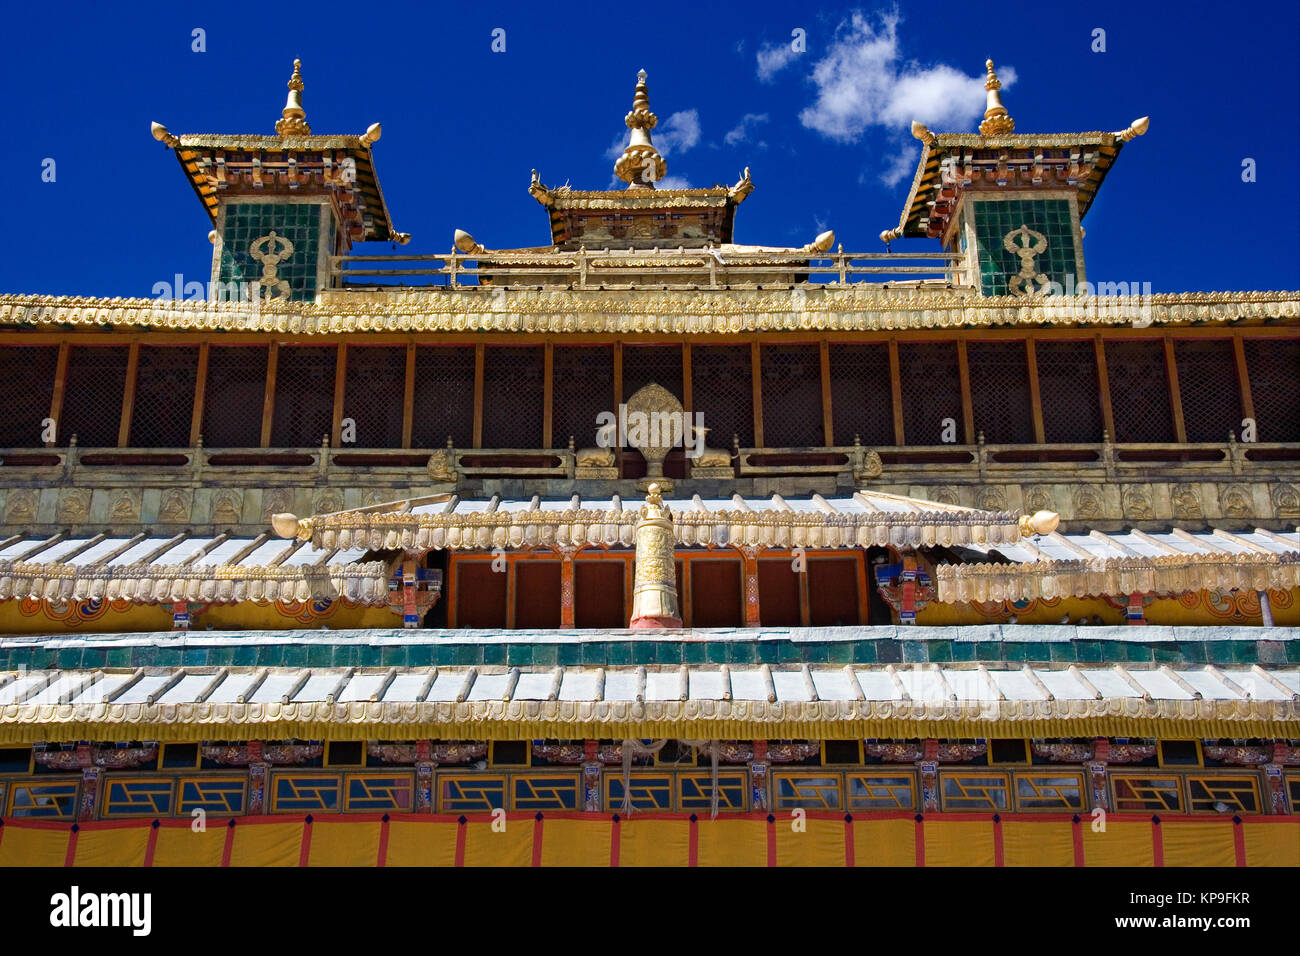 Rooftops of the Sera Buddhist Monastery in the Tibet Autonomous Region of China. - Stock Image